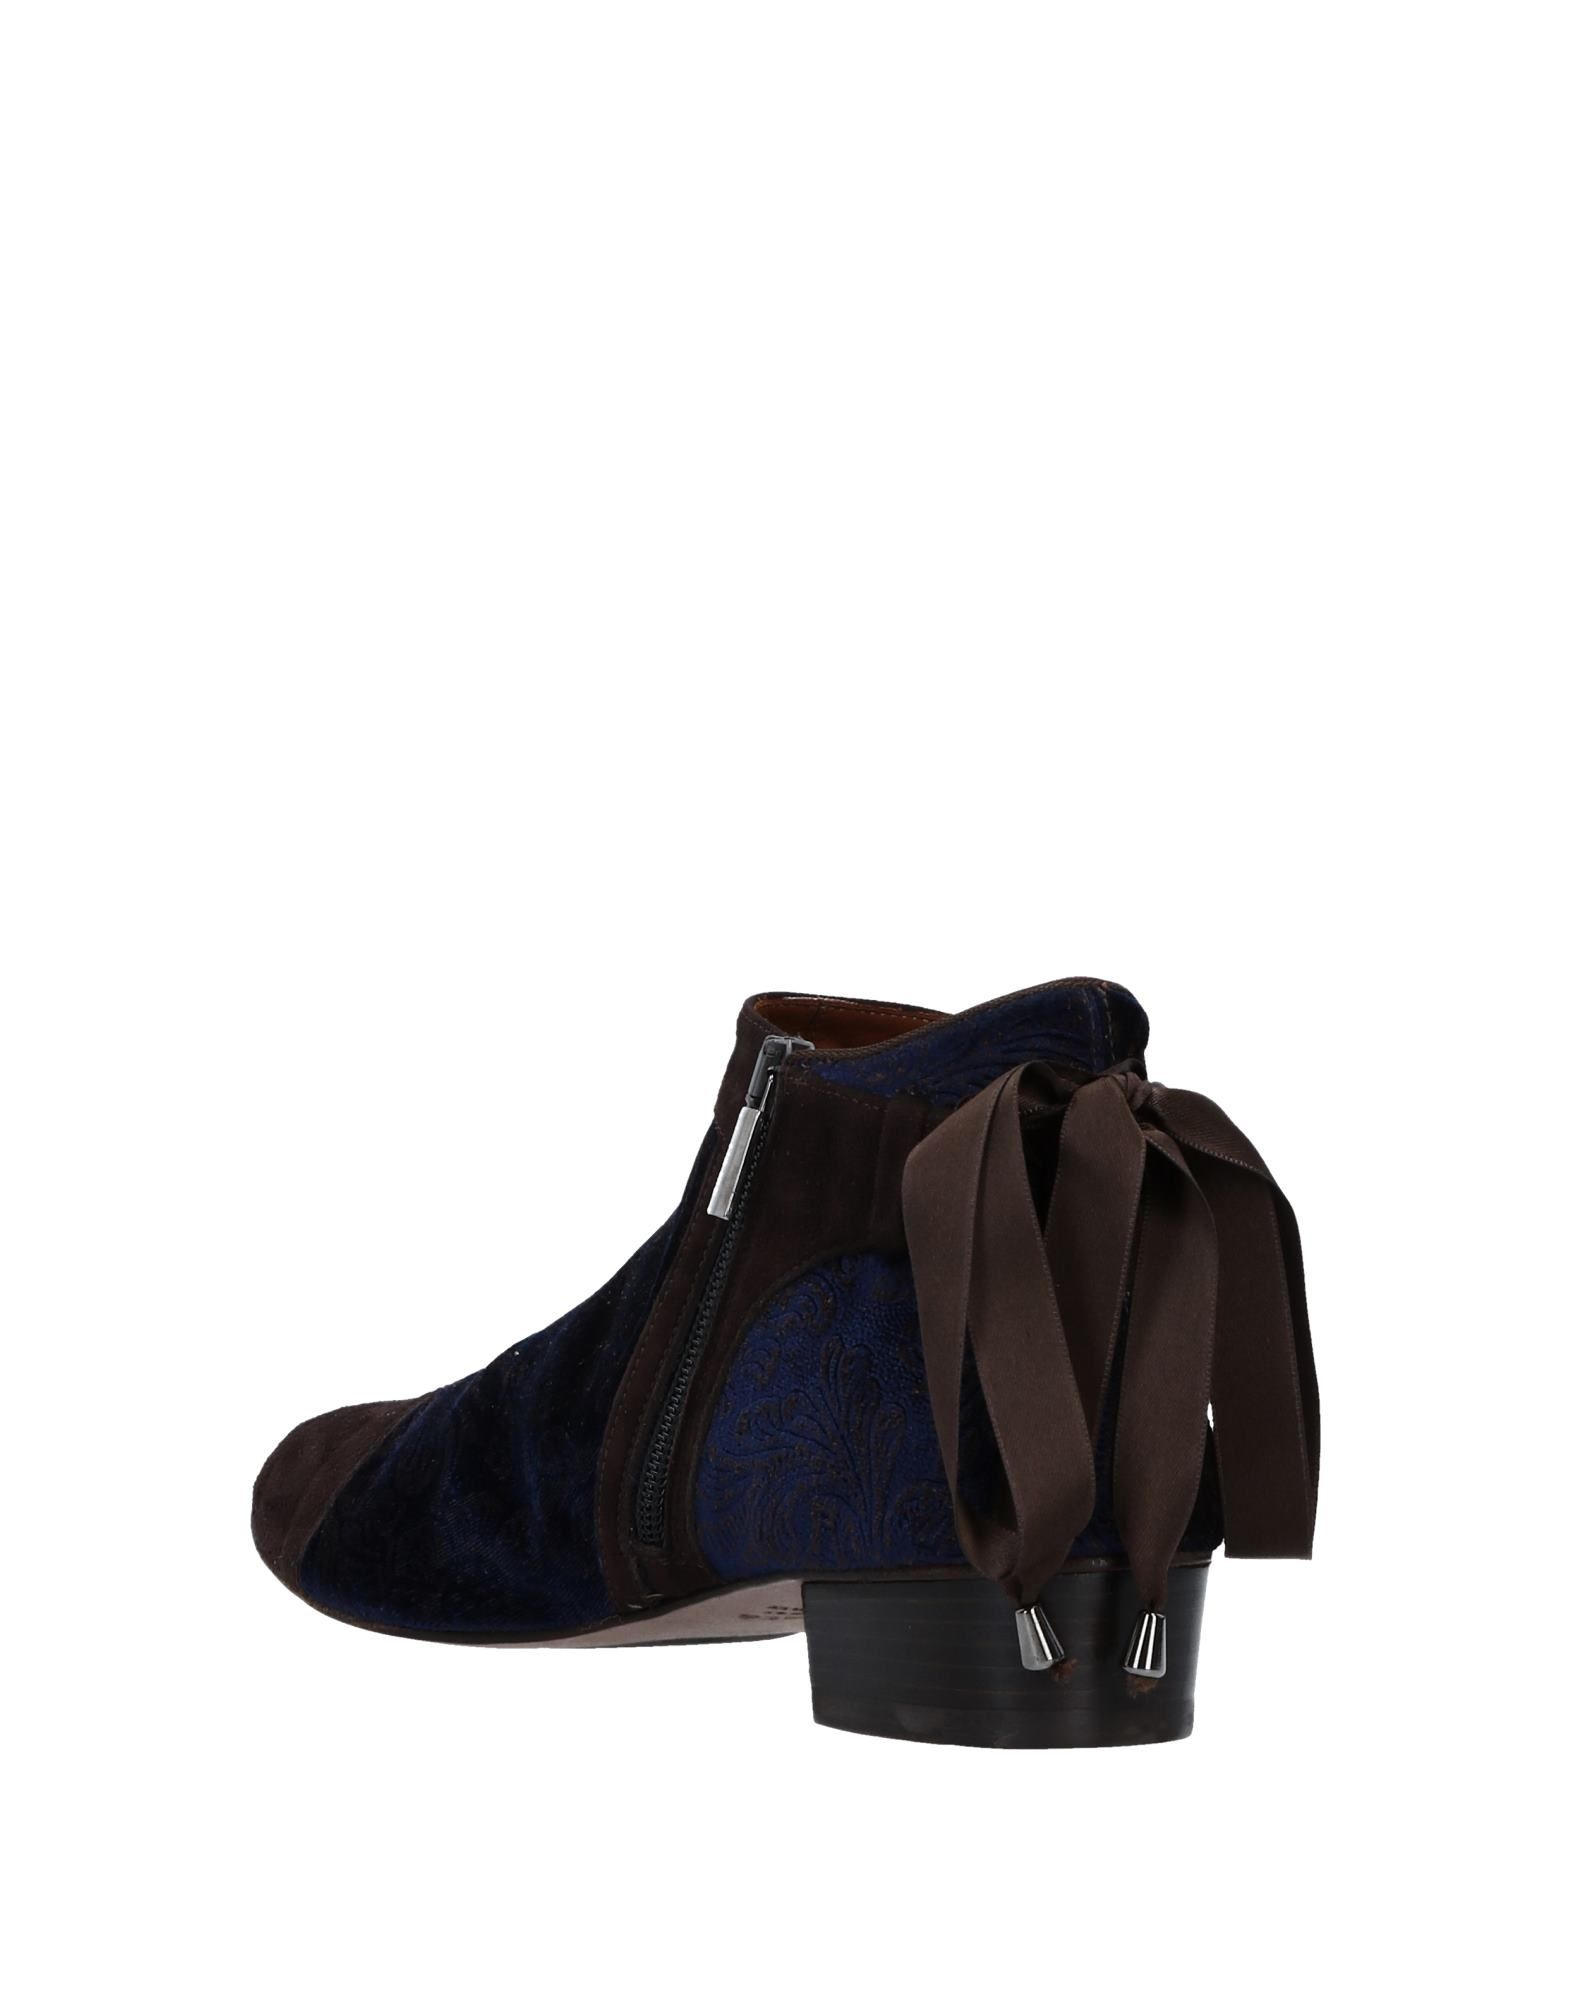 Kudetà Stiefelette Damen  11539867RQGut aussehende strapazierfähige Schuhe Schuhe strapazierfähige 20c2bc